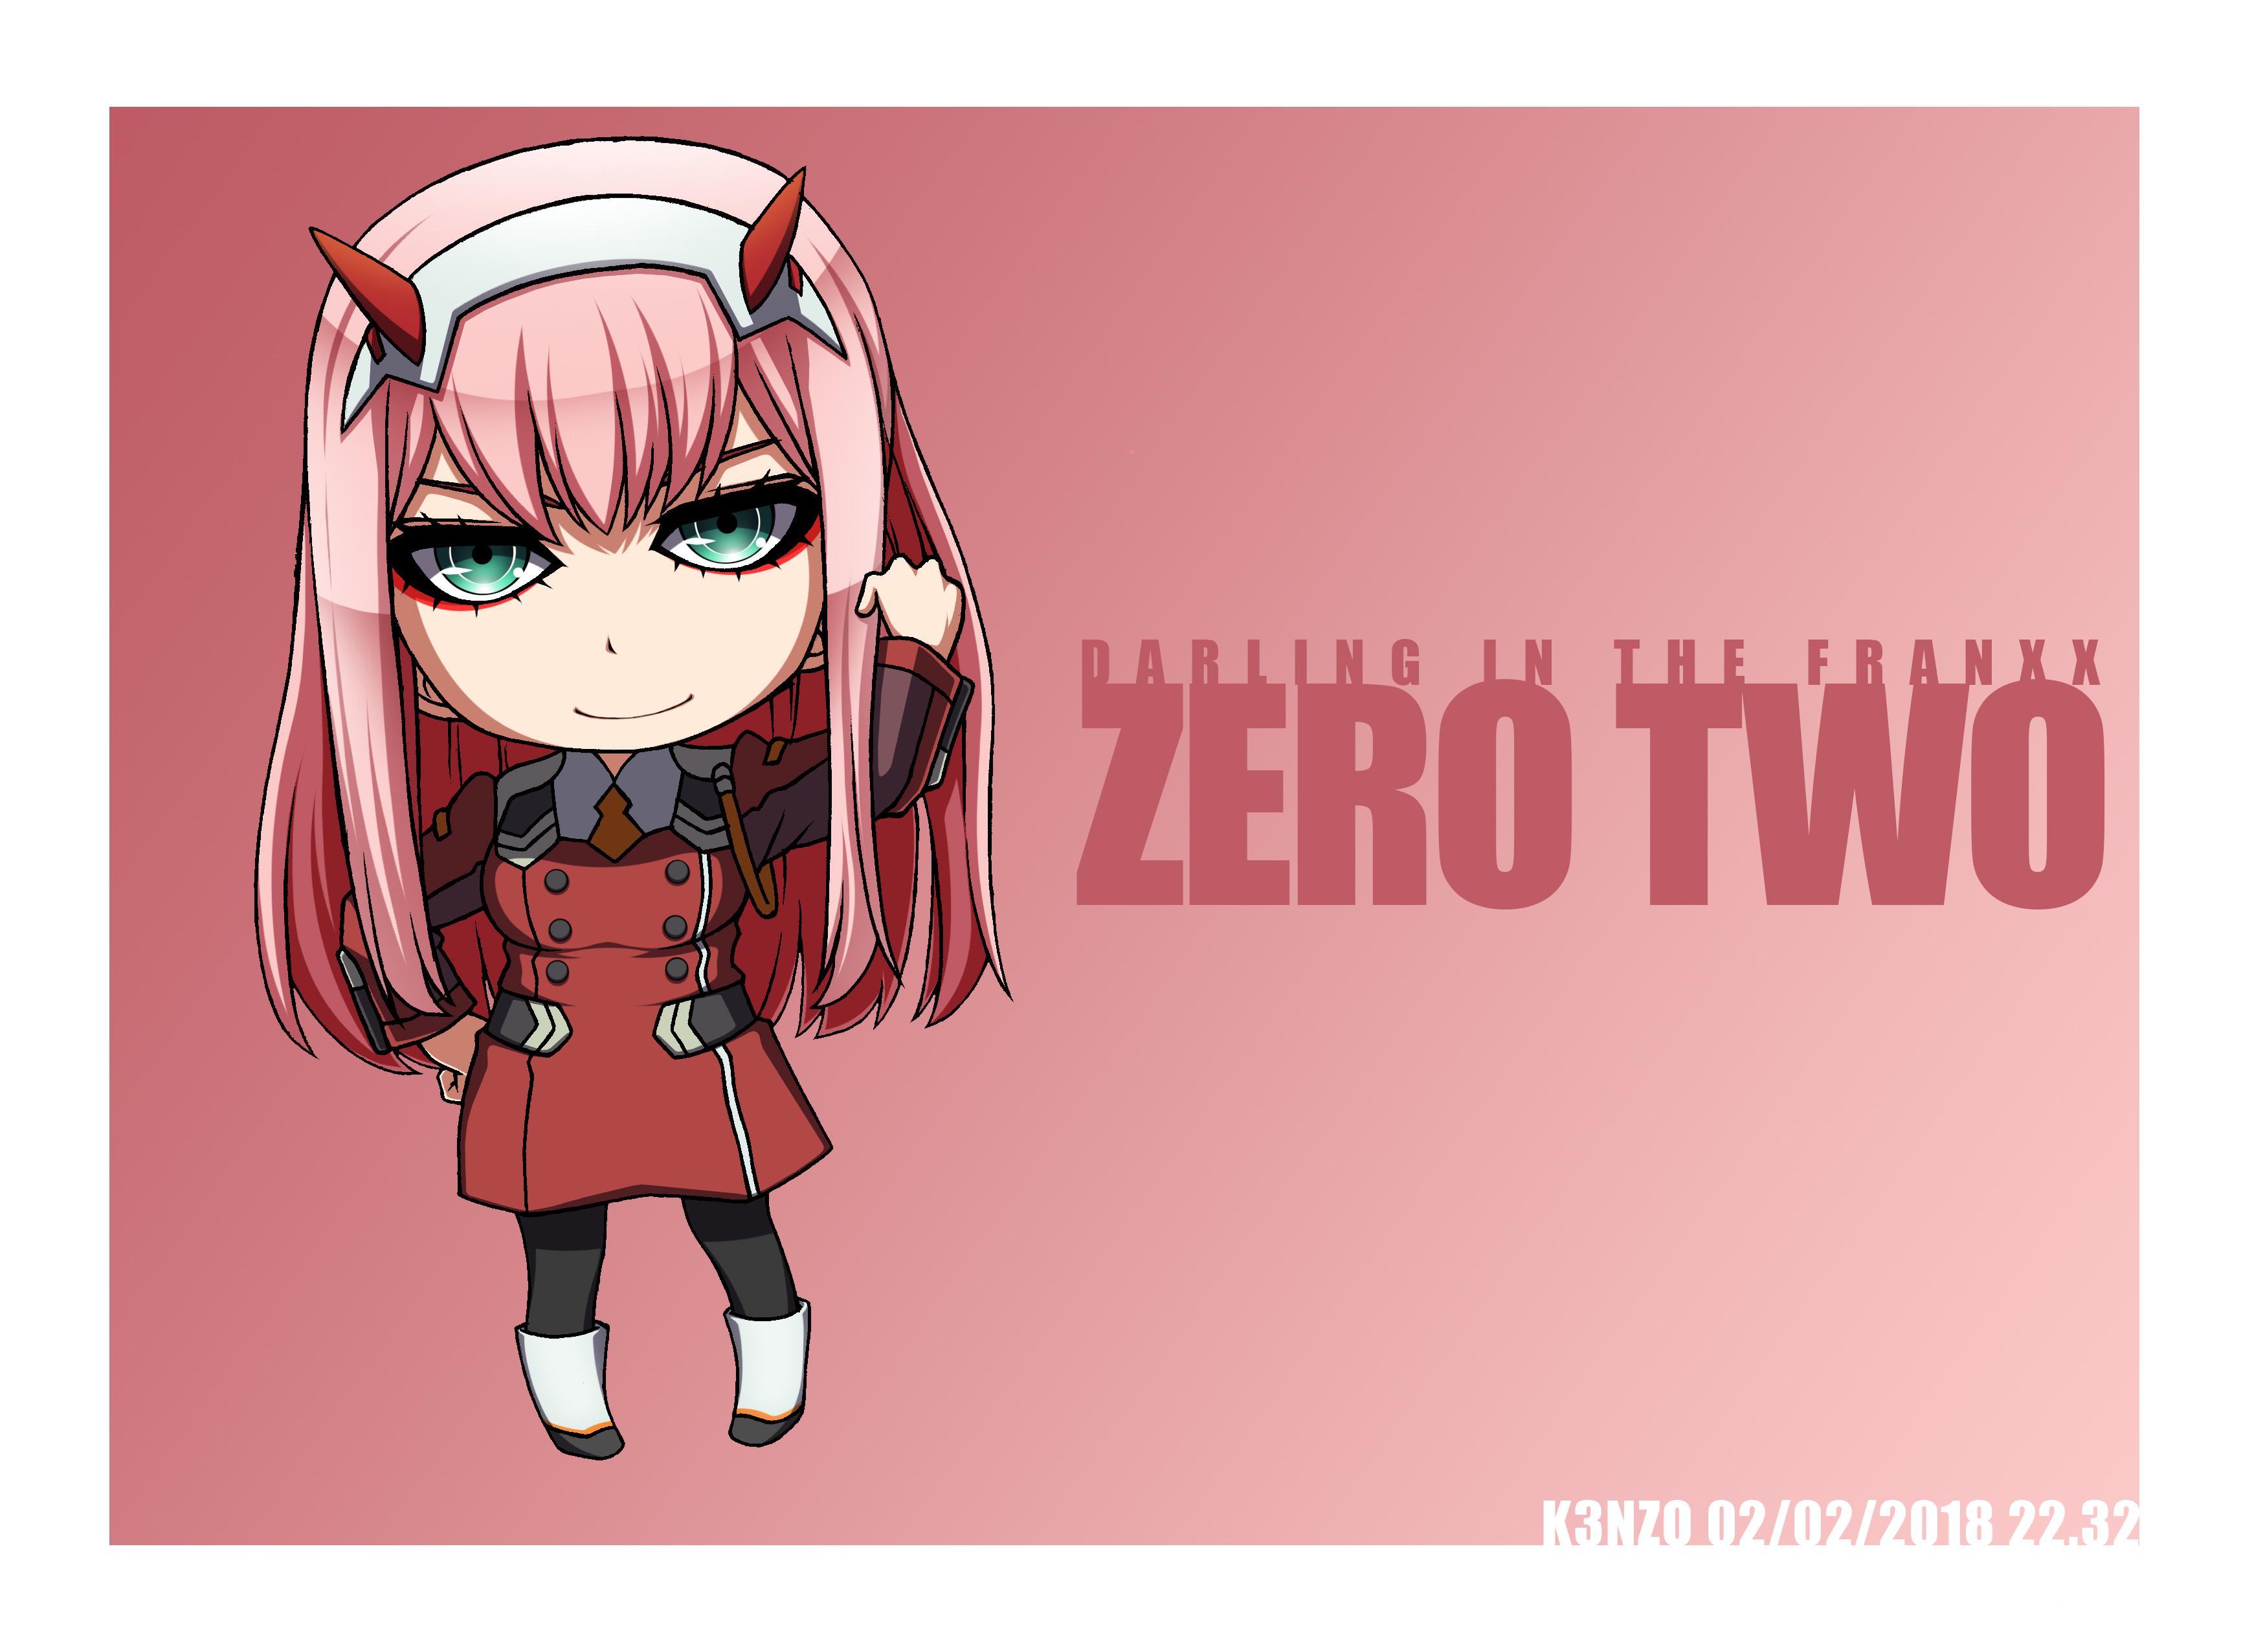 Zero Two (Darling In The FranXX) Image #2261874